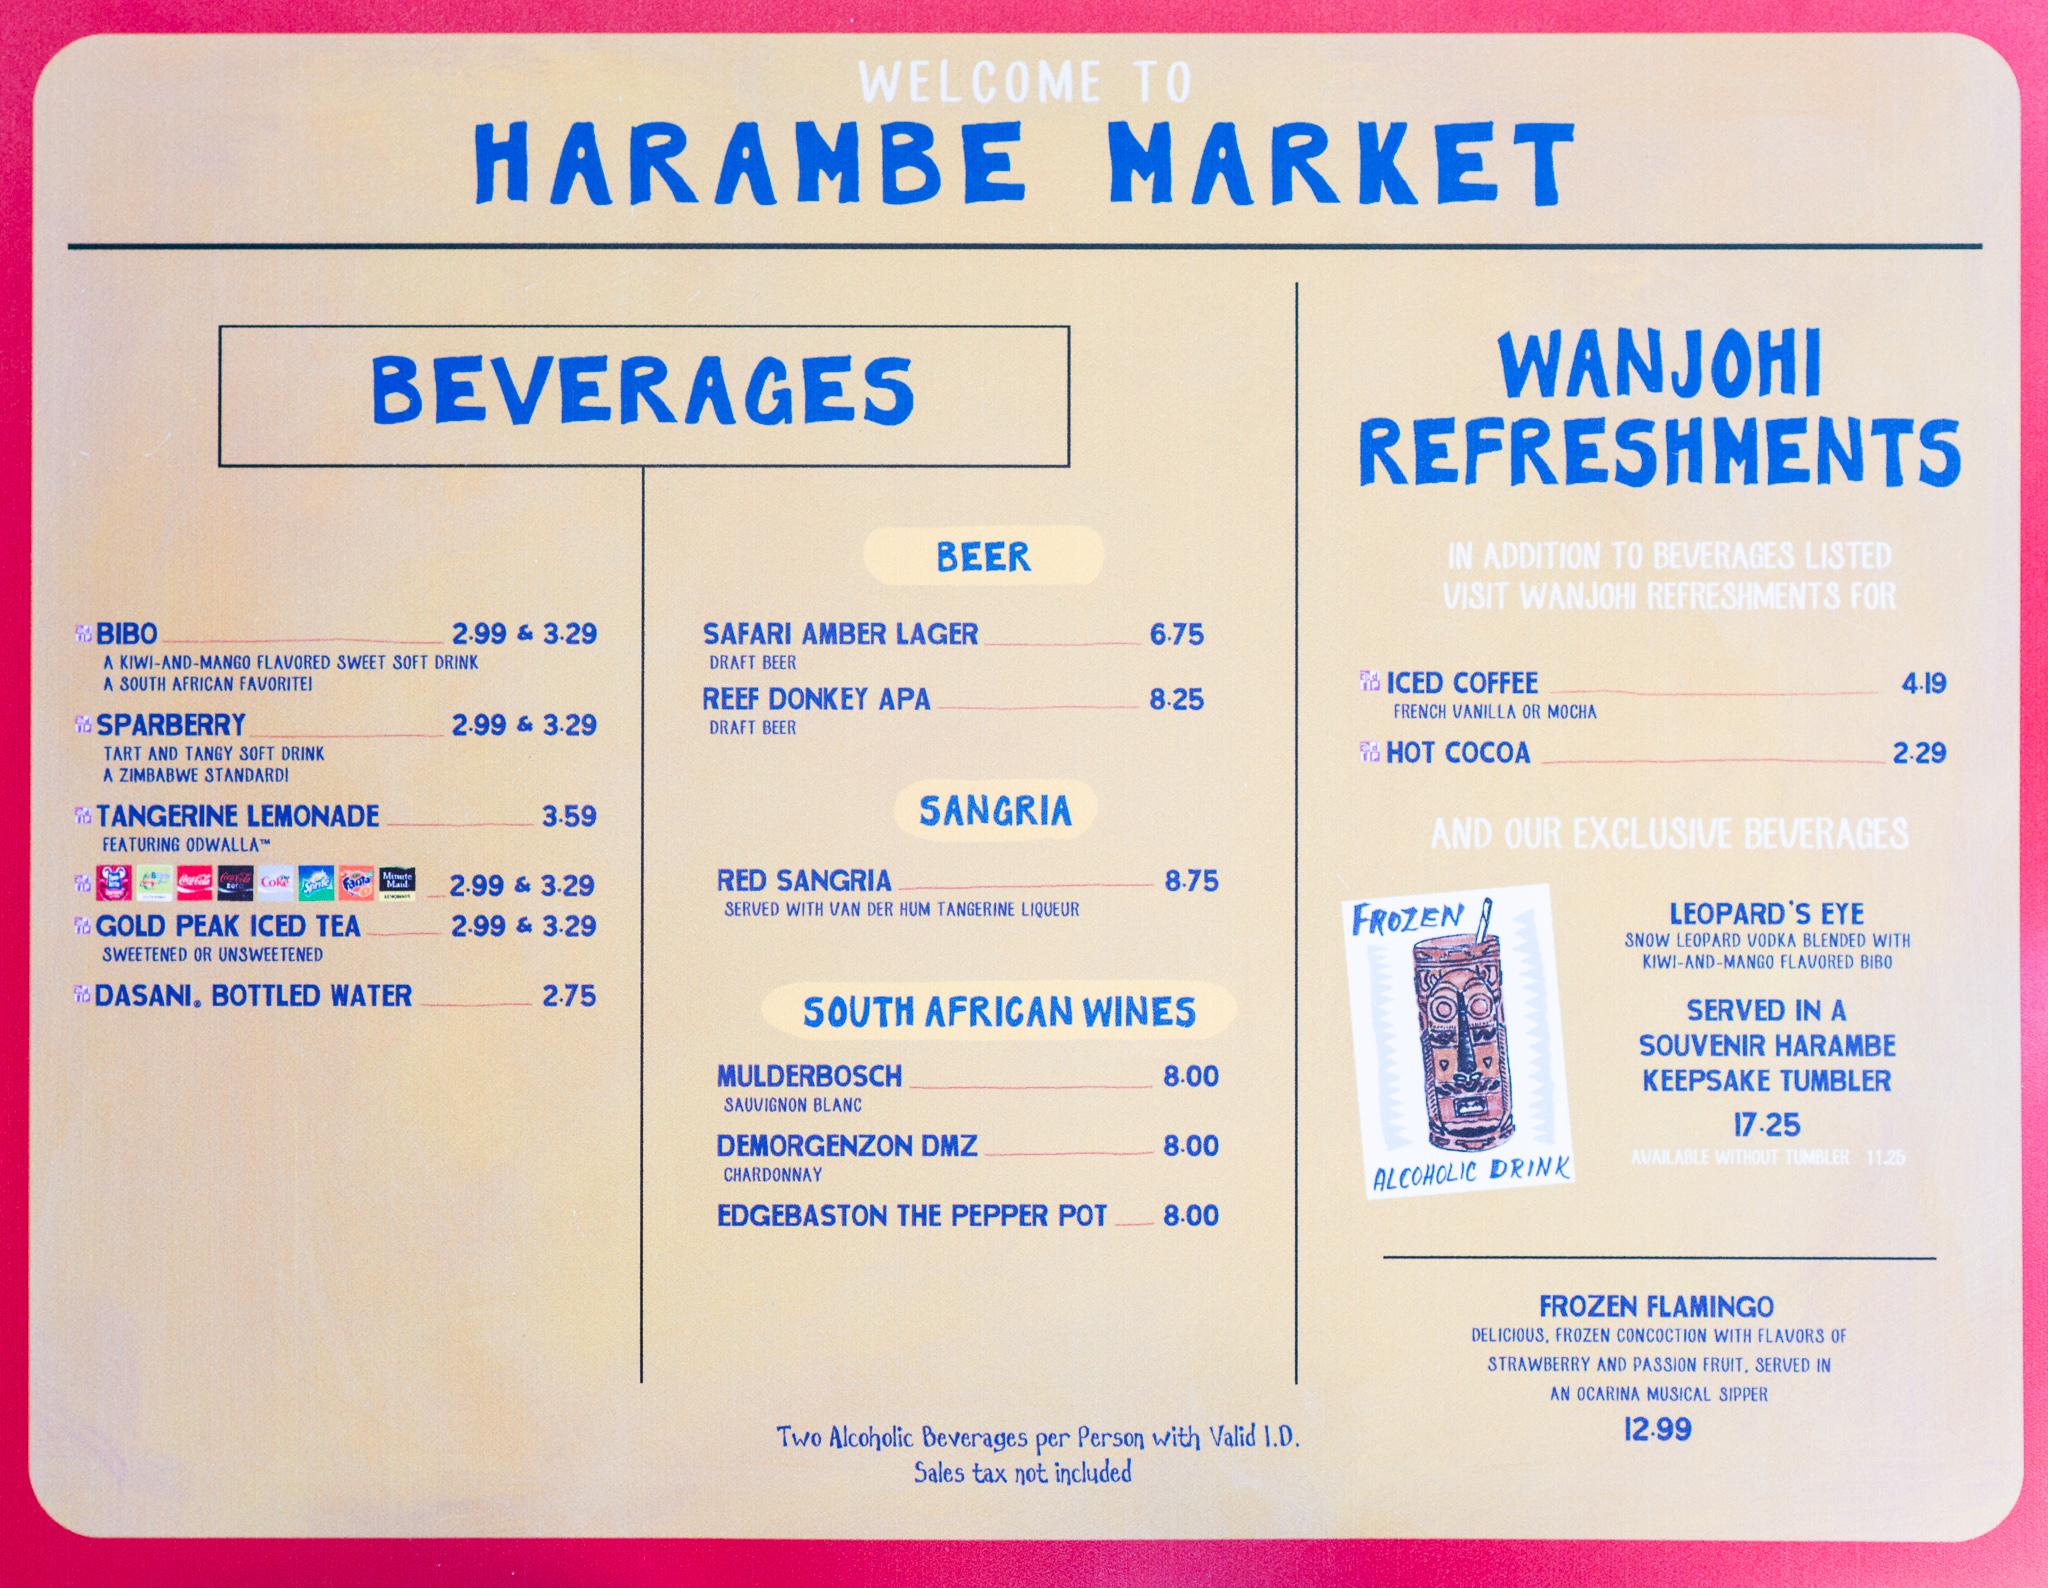 Harambe Market Beverage Menu - Disney's Animal Kingdom